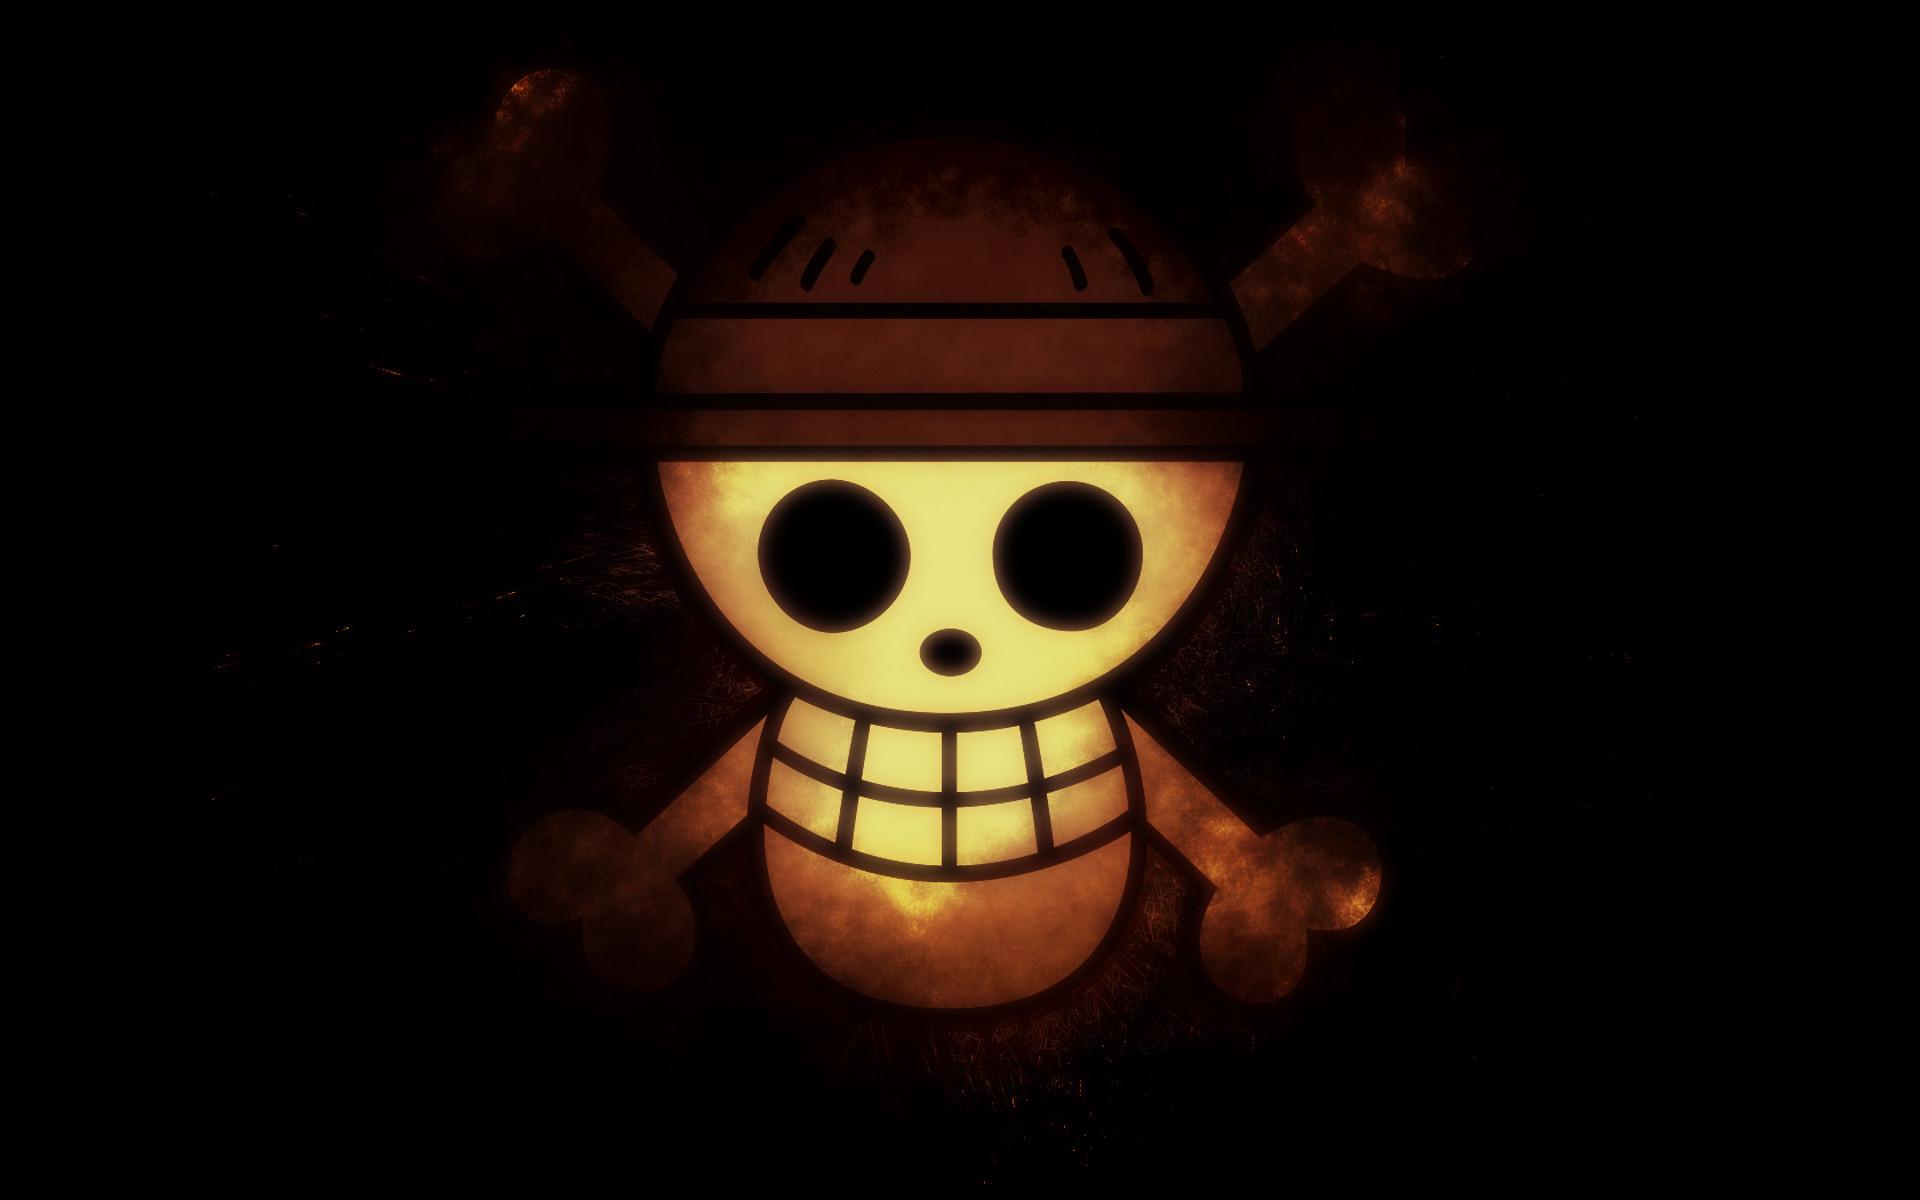 One Piece Logo Pirates Black Wallpaper Anime Images HD Free #3202939449